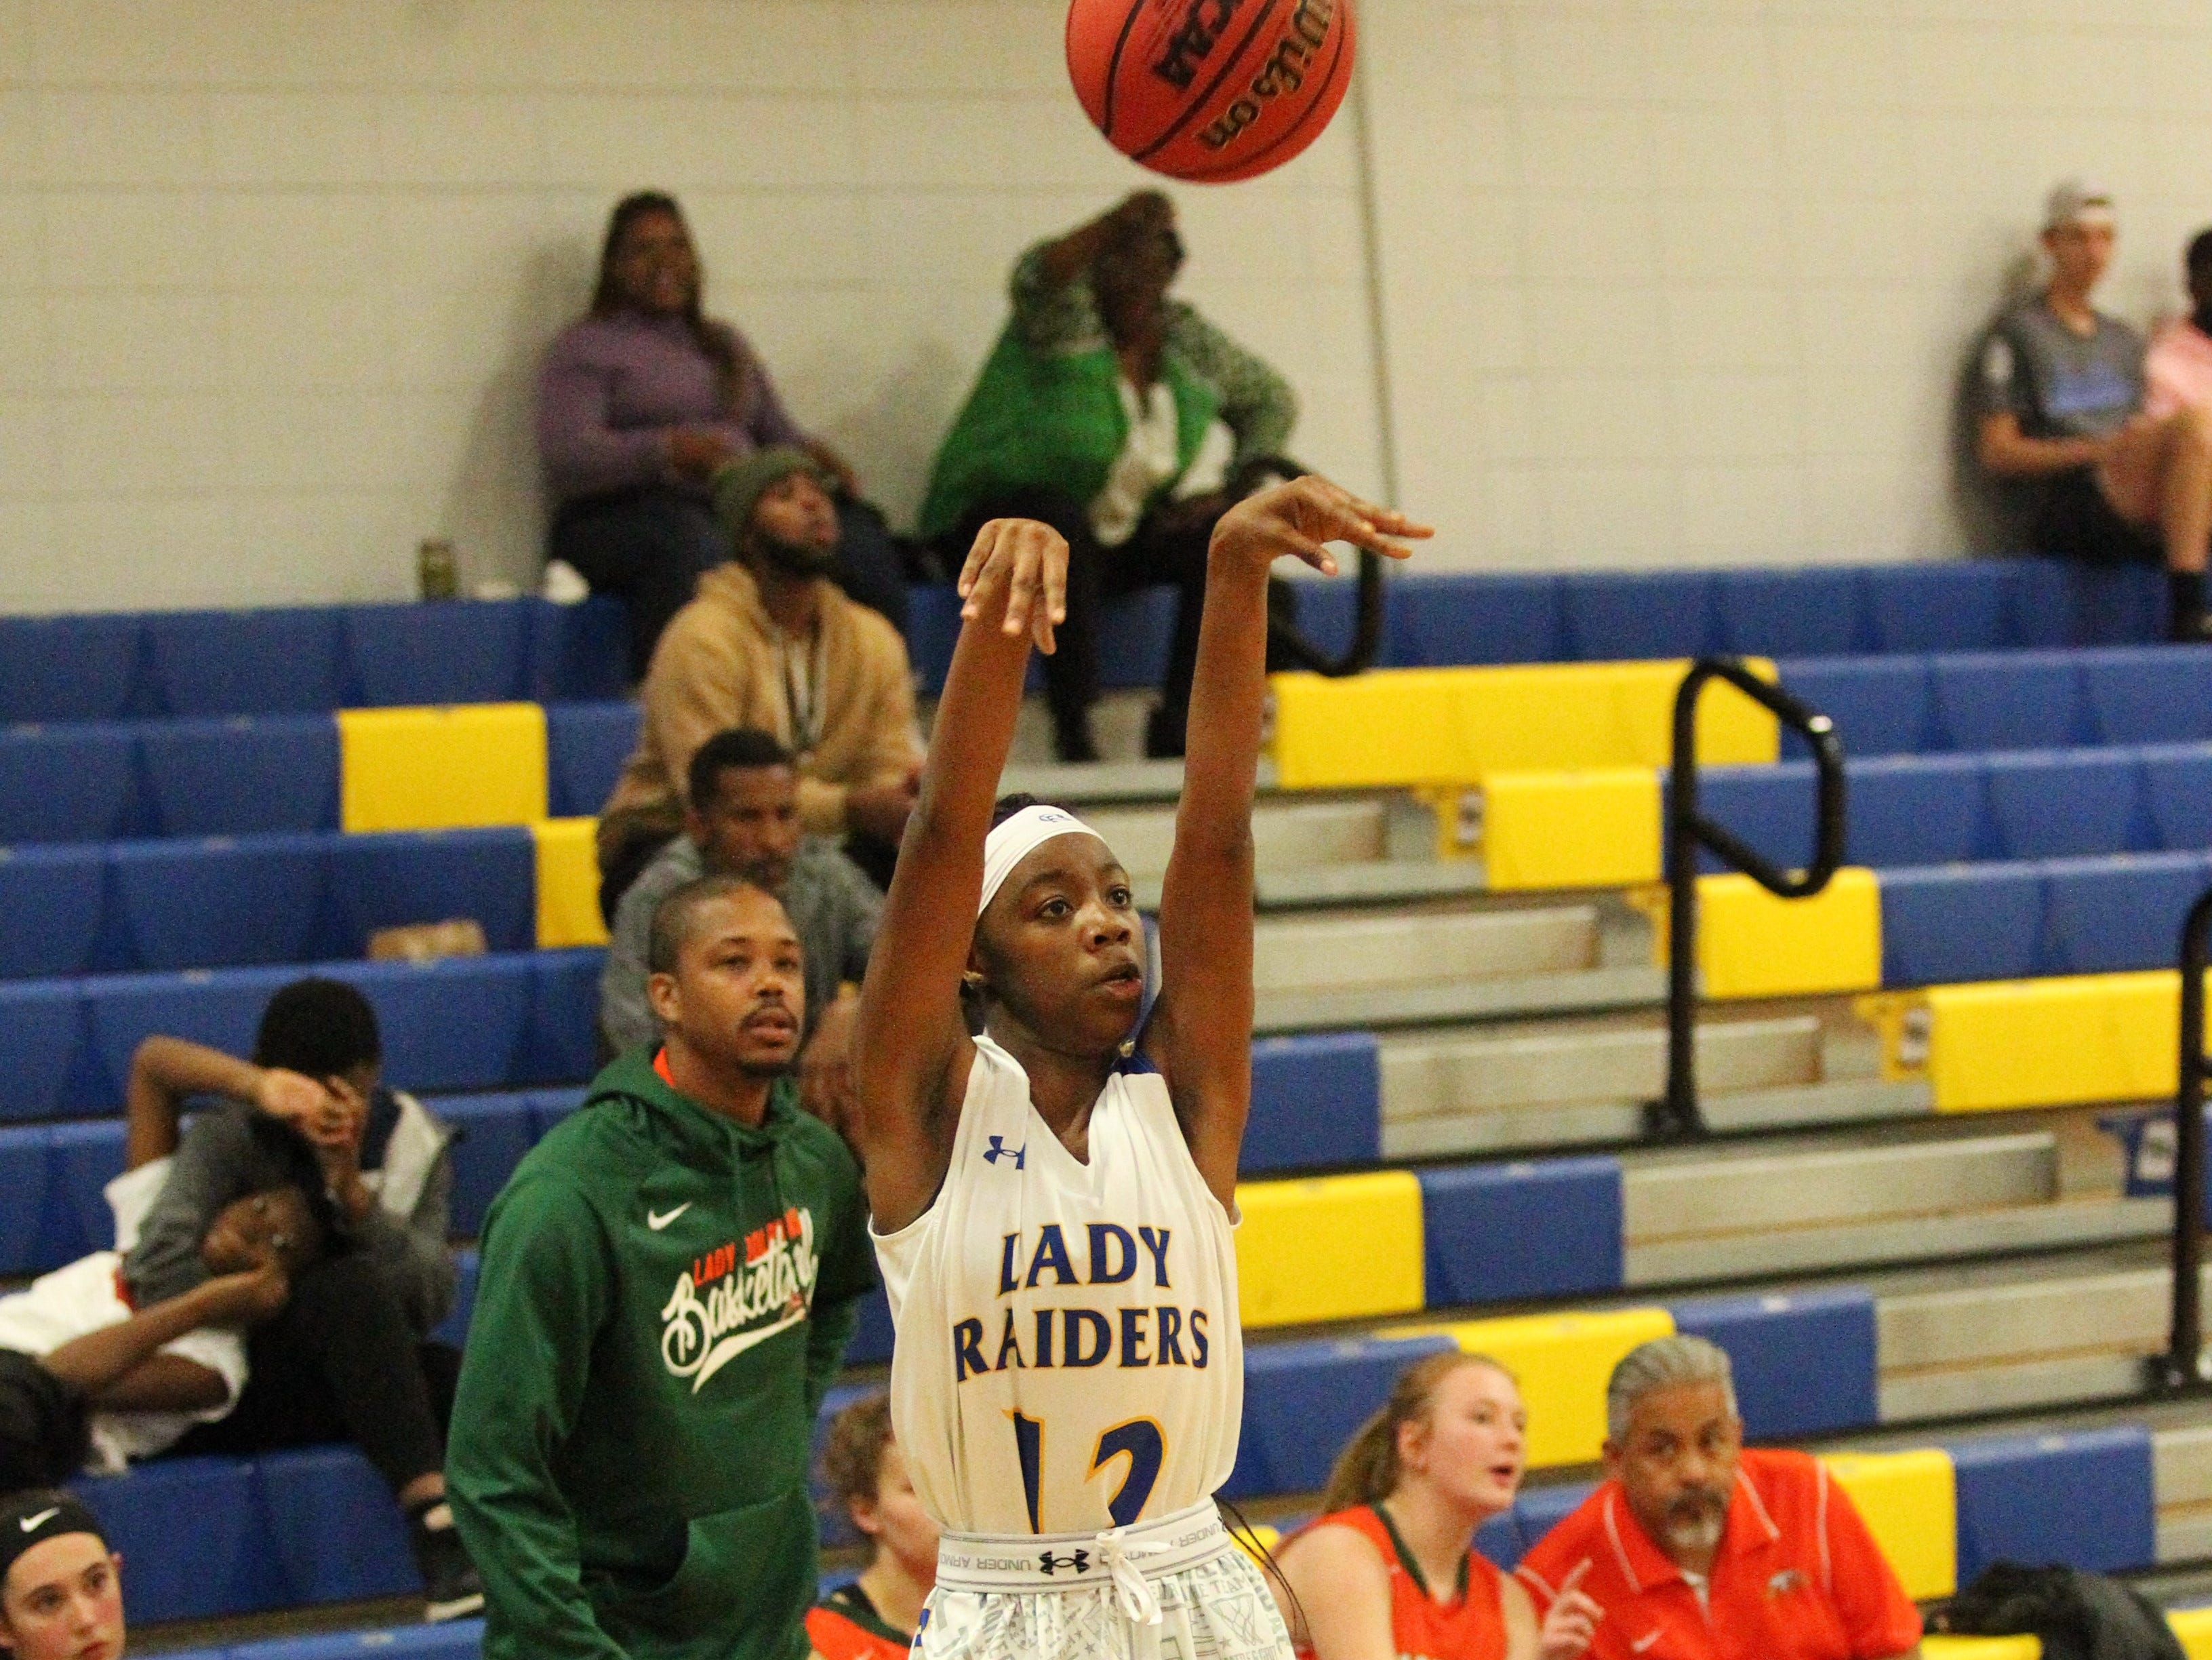 Rickards' Ja'Kiyah Robinson drills a 3-pointer as Rickards' girls basketball team beat Mosley 61-27 in a Region 1-6A quarterfinal on Feb. 14, 2019.